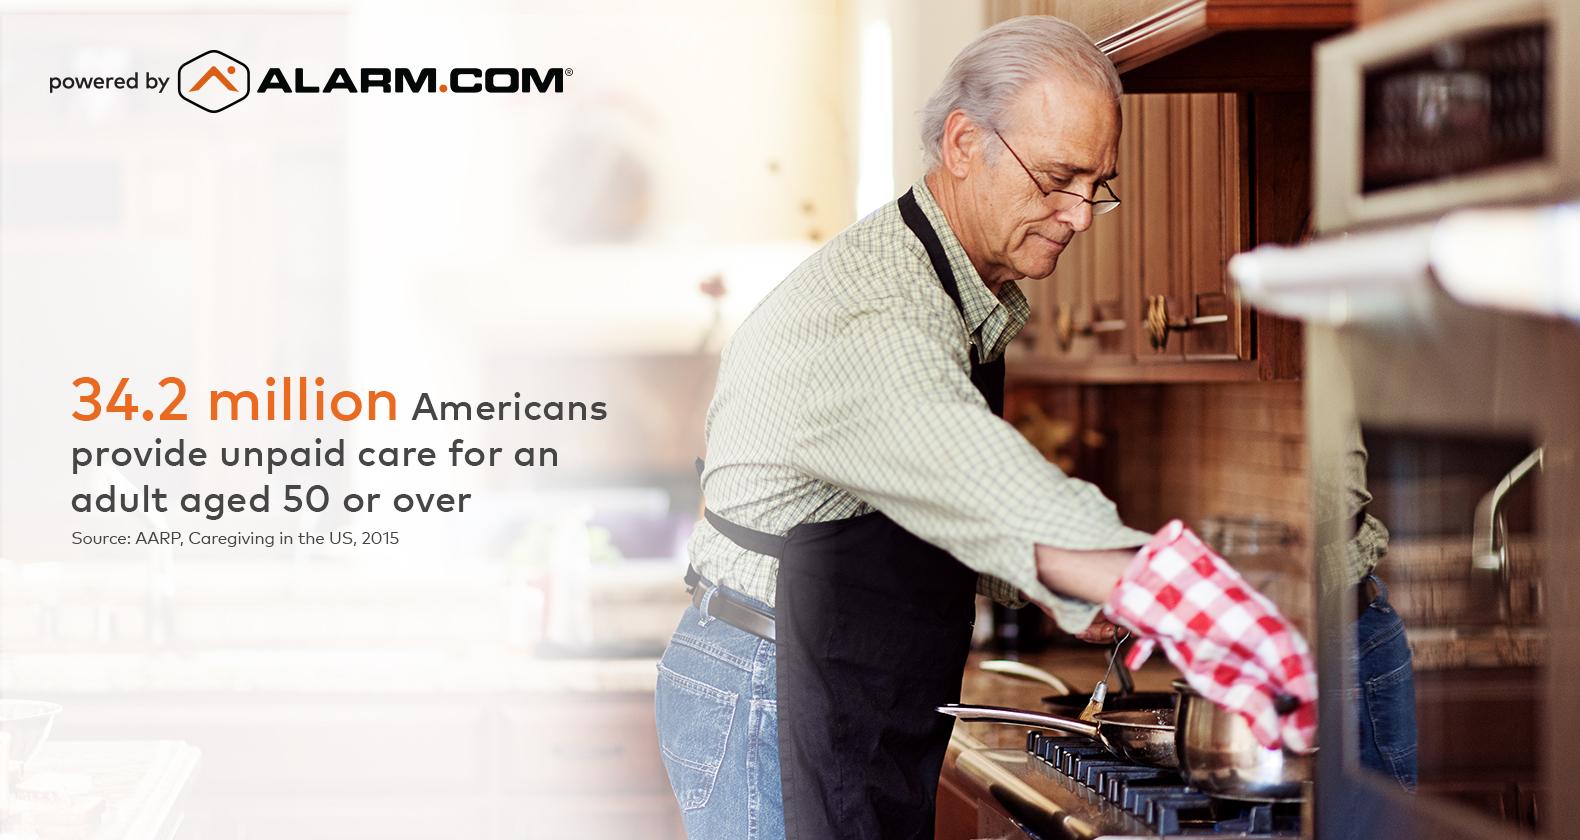 senior in kitchen alone with alarm statistics